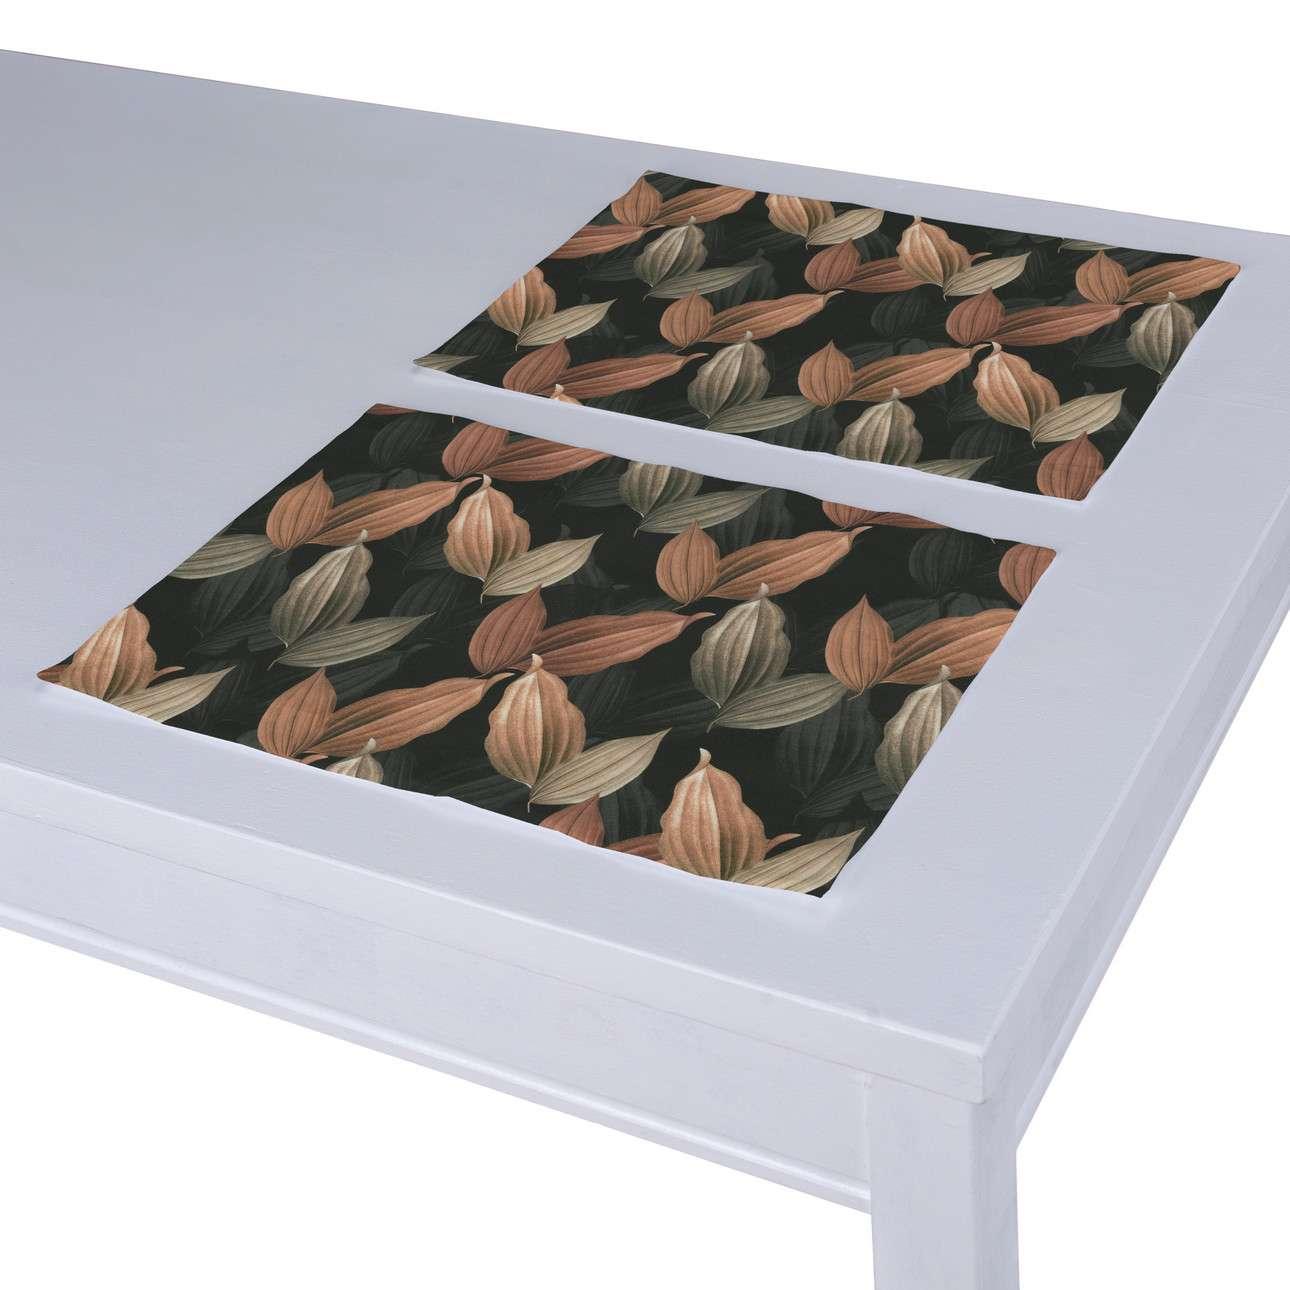 Podkładka 2 sztuki w kolekcji Abigail, tkanina: 143-21